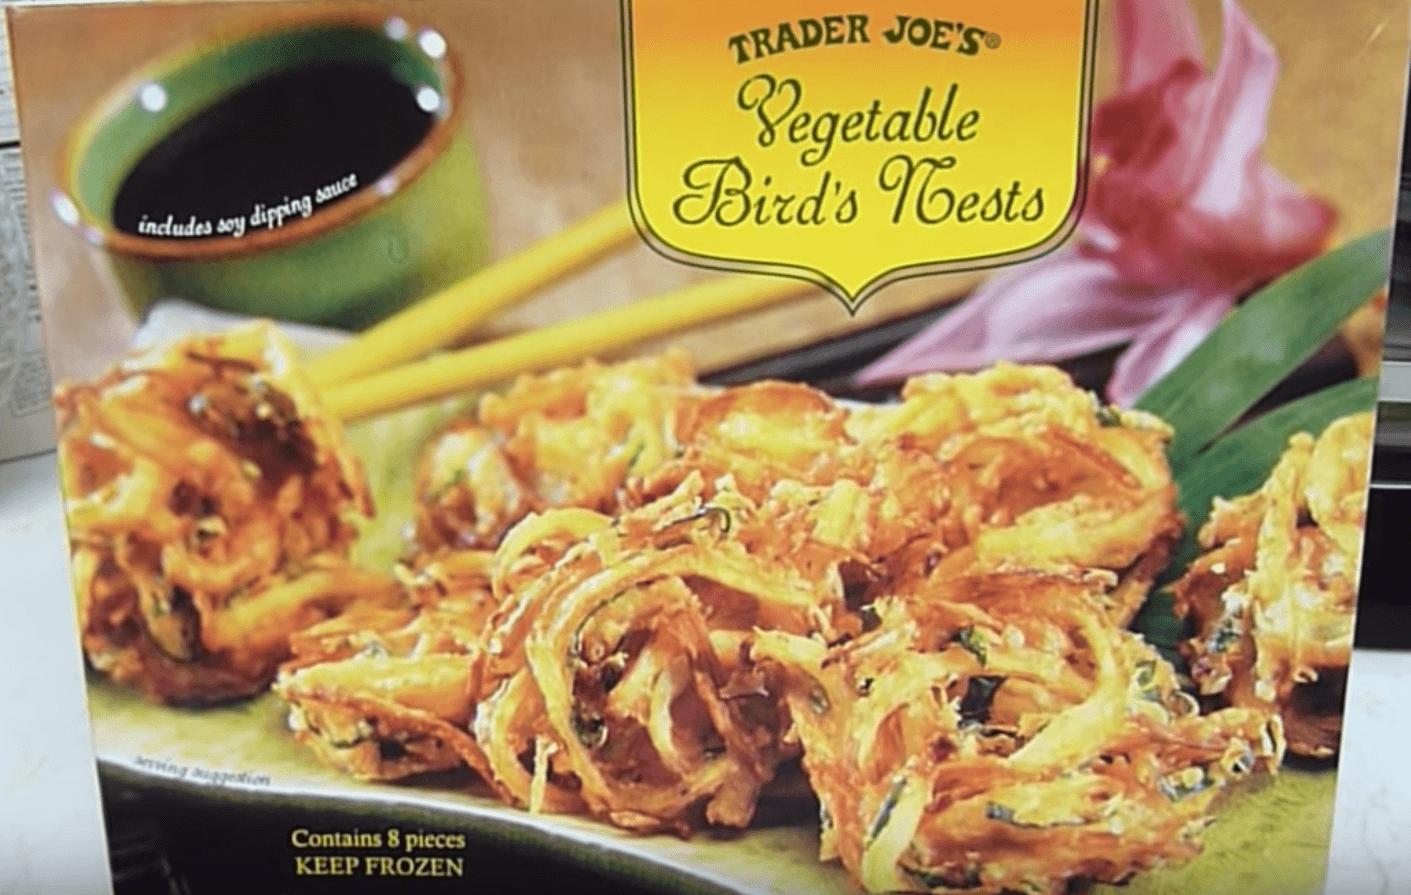 Trader Joe's vegetable bird's nest